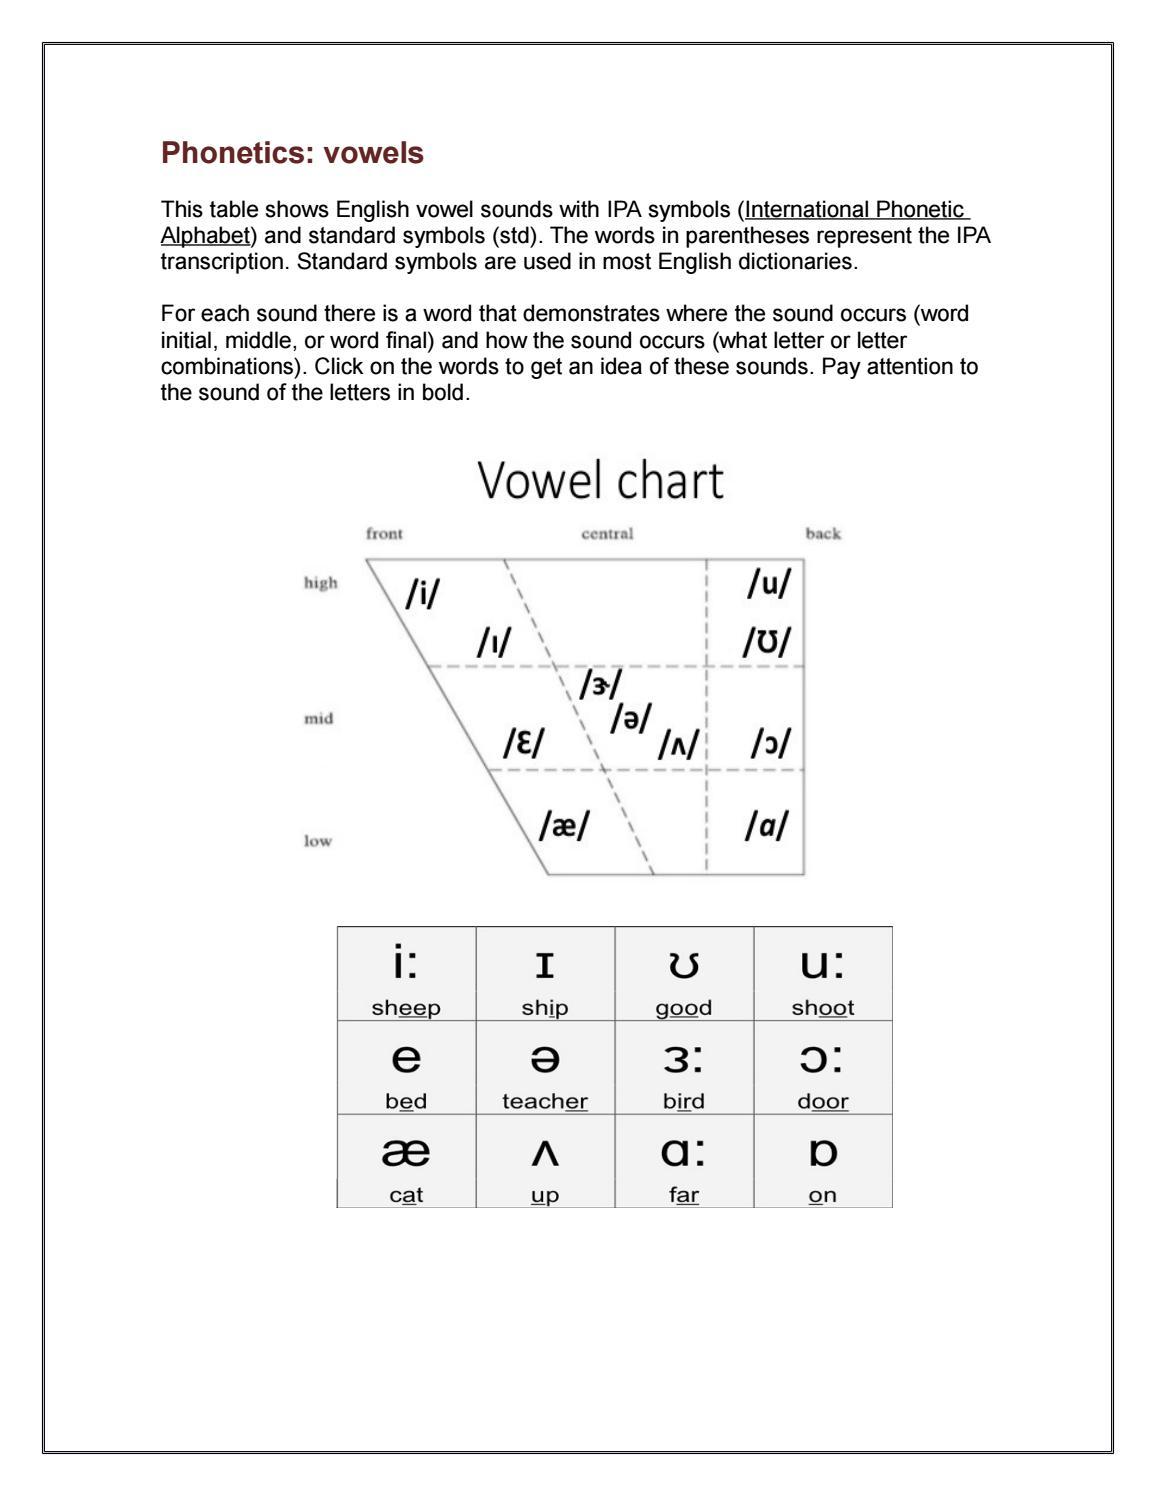 Phonetics by vowels sounds issuu biocorpaavc